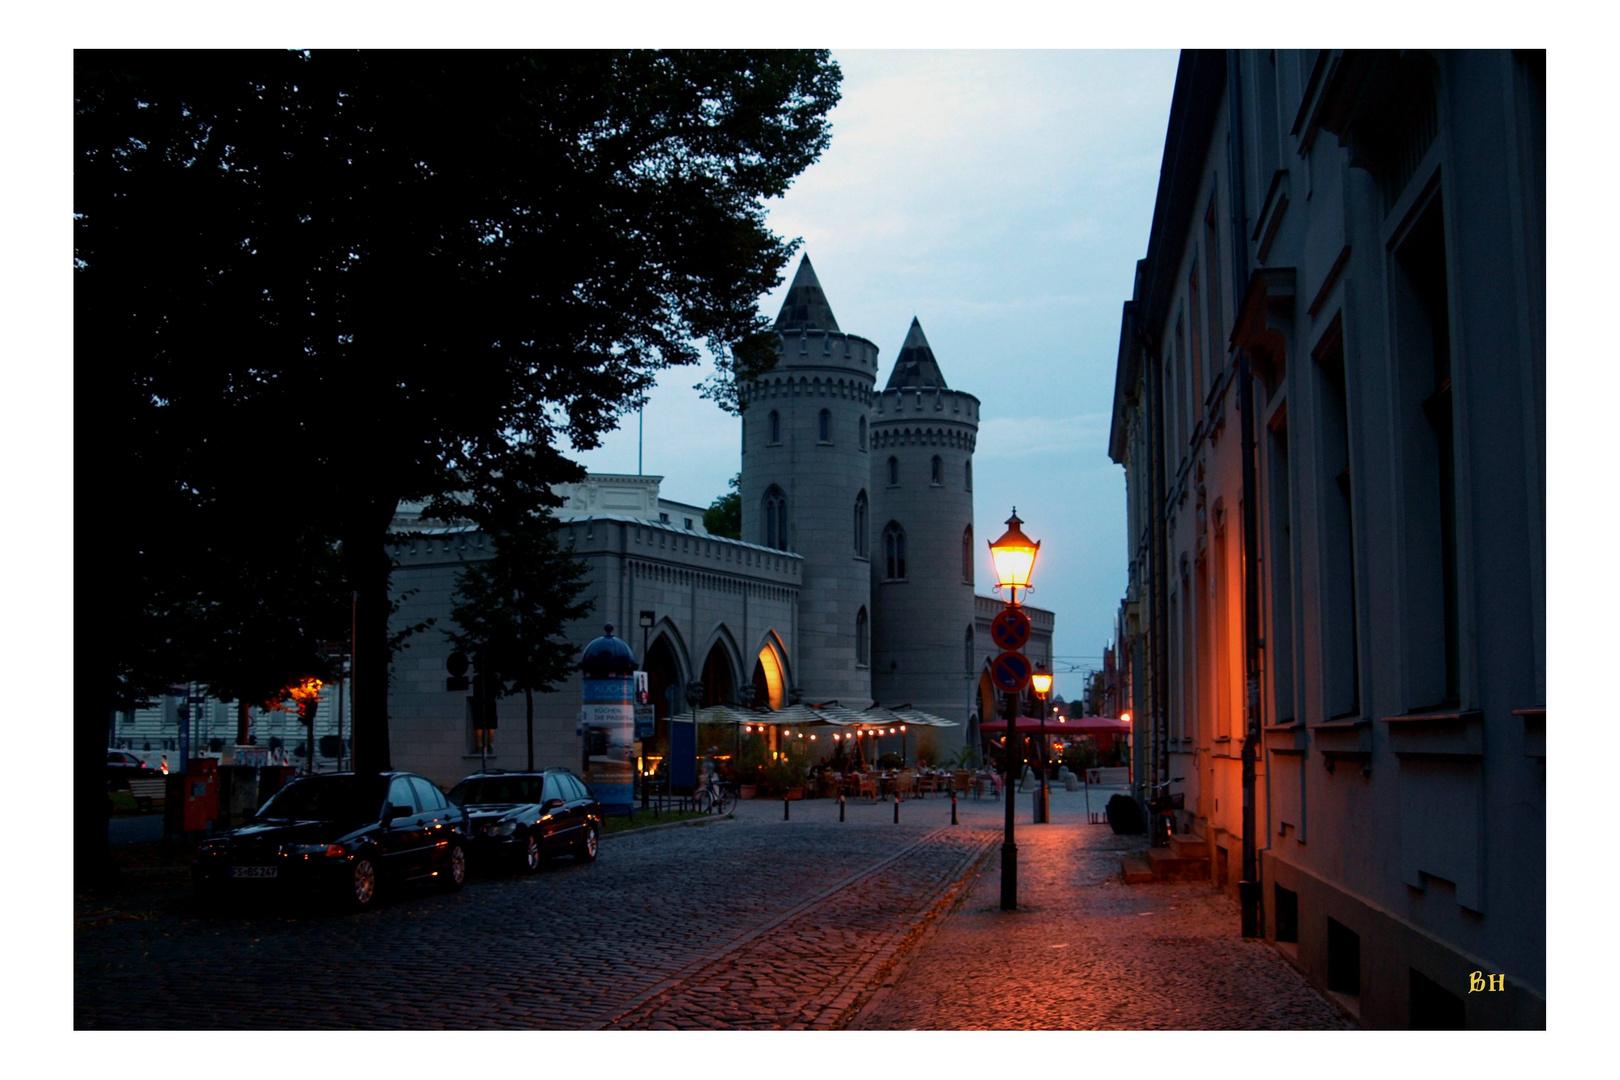 Am Abend in Potsdam